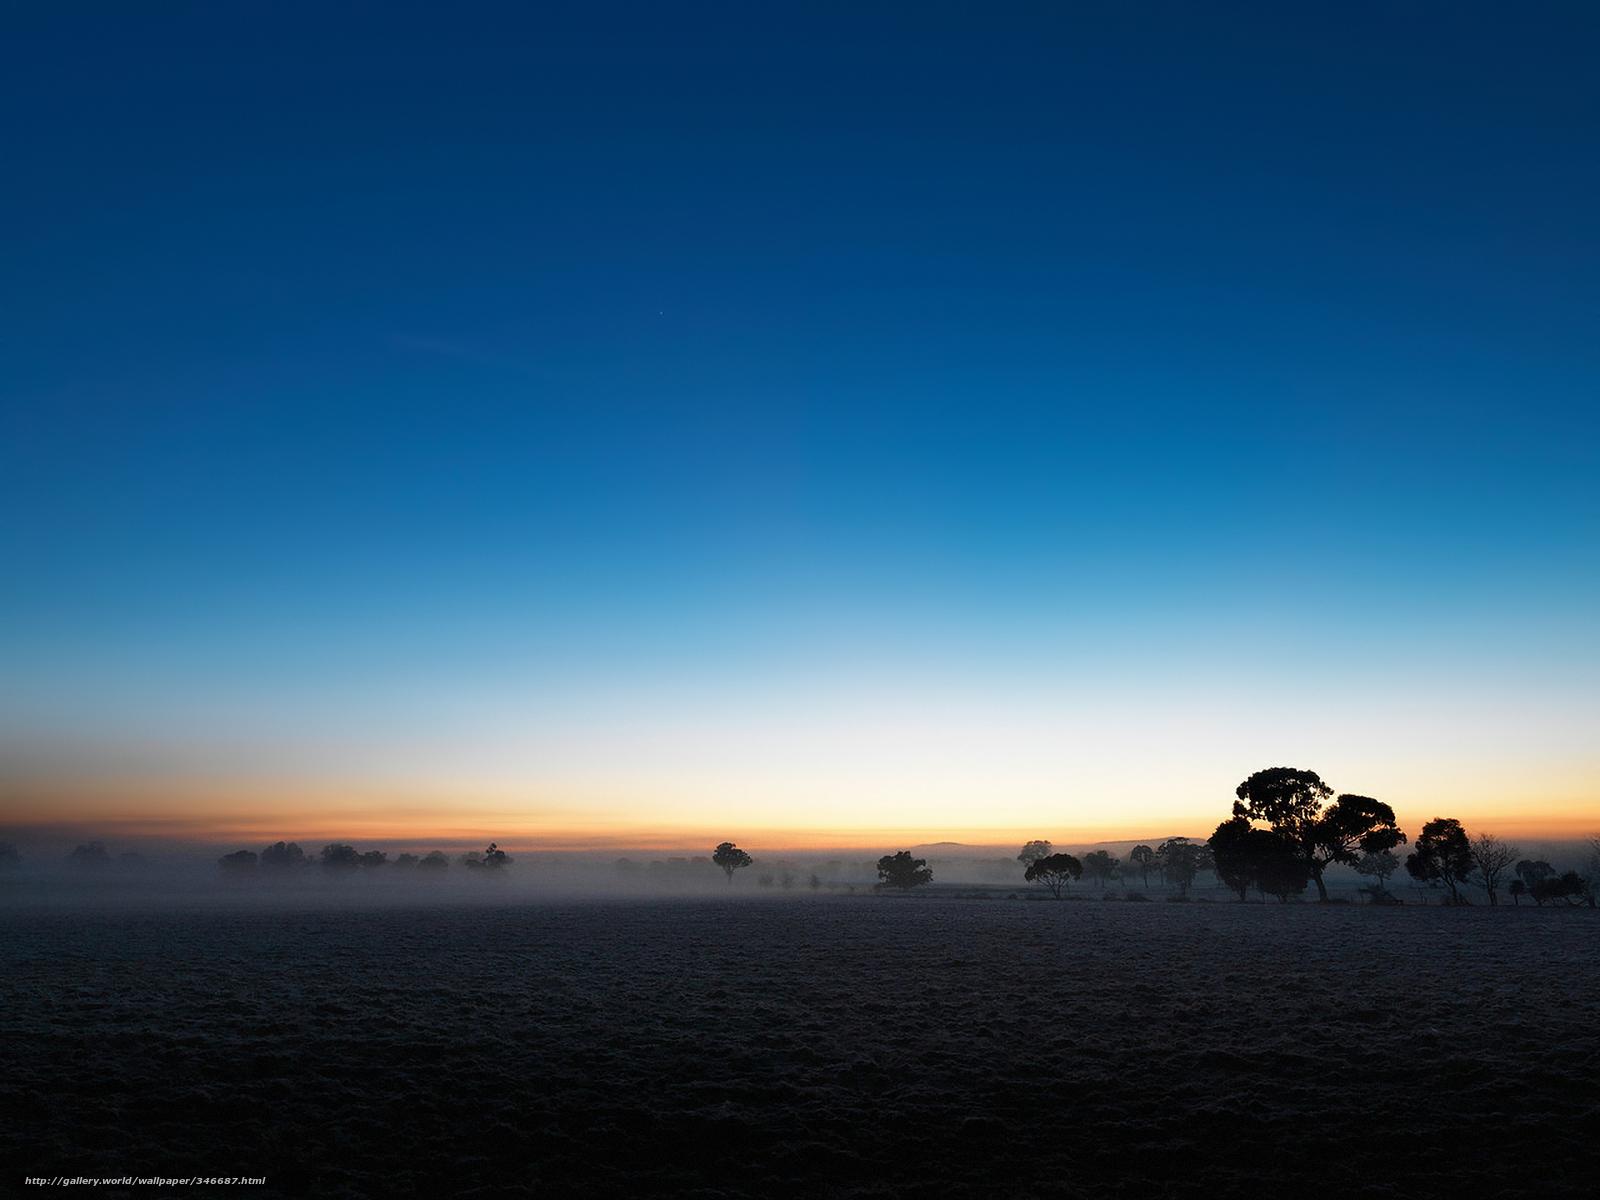 Download Wallpaper Field Plain Sky Twilight Free